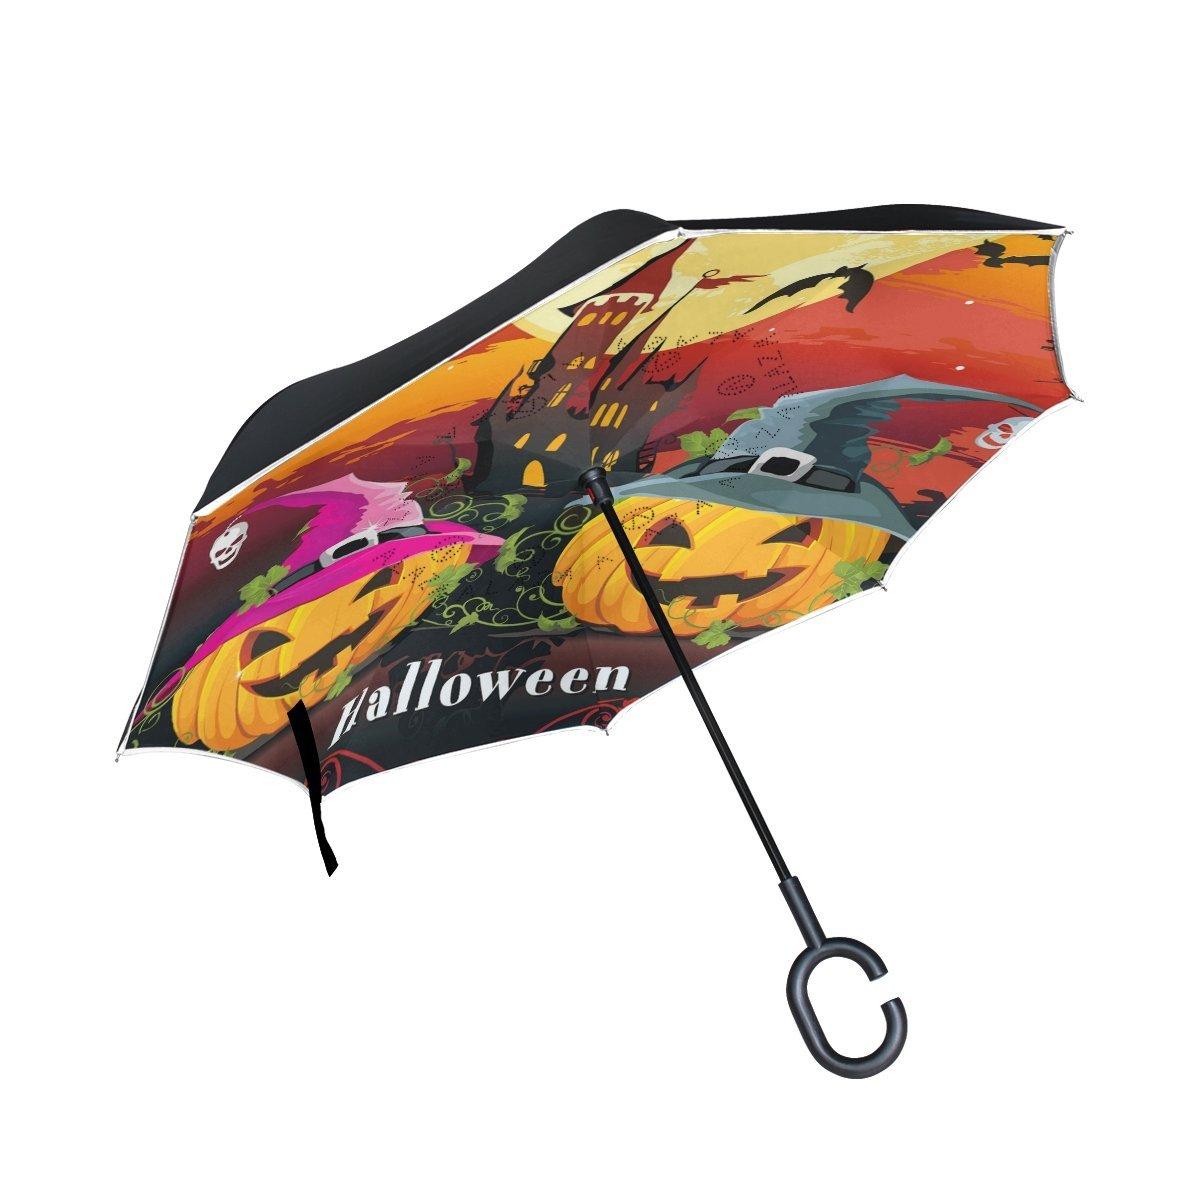 La Random Halloween Abstract Classical Autumn Pumpkin And Foliage Inverted Umbrella Double Layer Windproof UV Protection Compact Car Reverse Umbrella